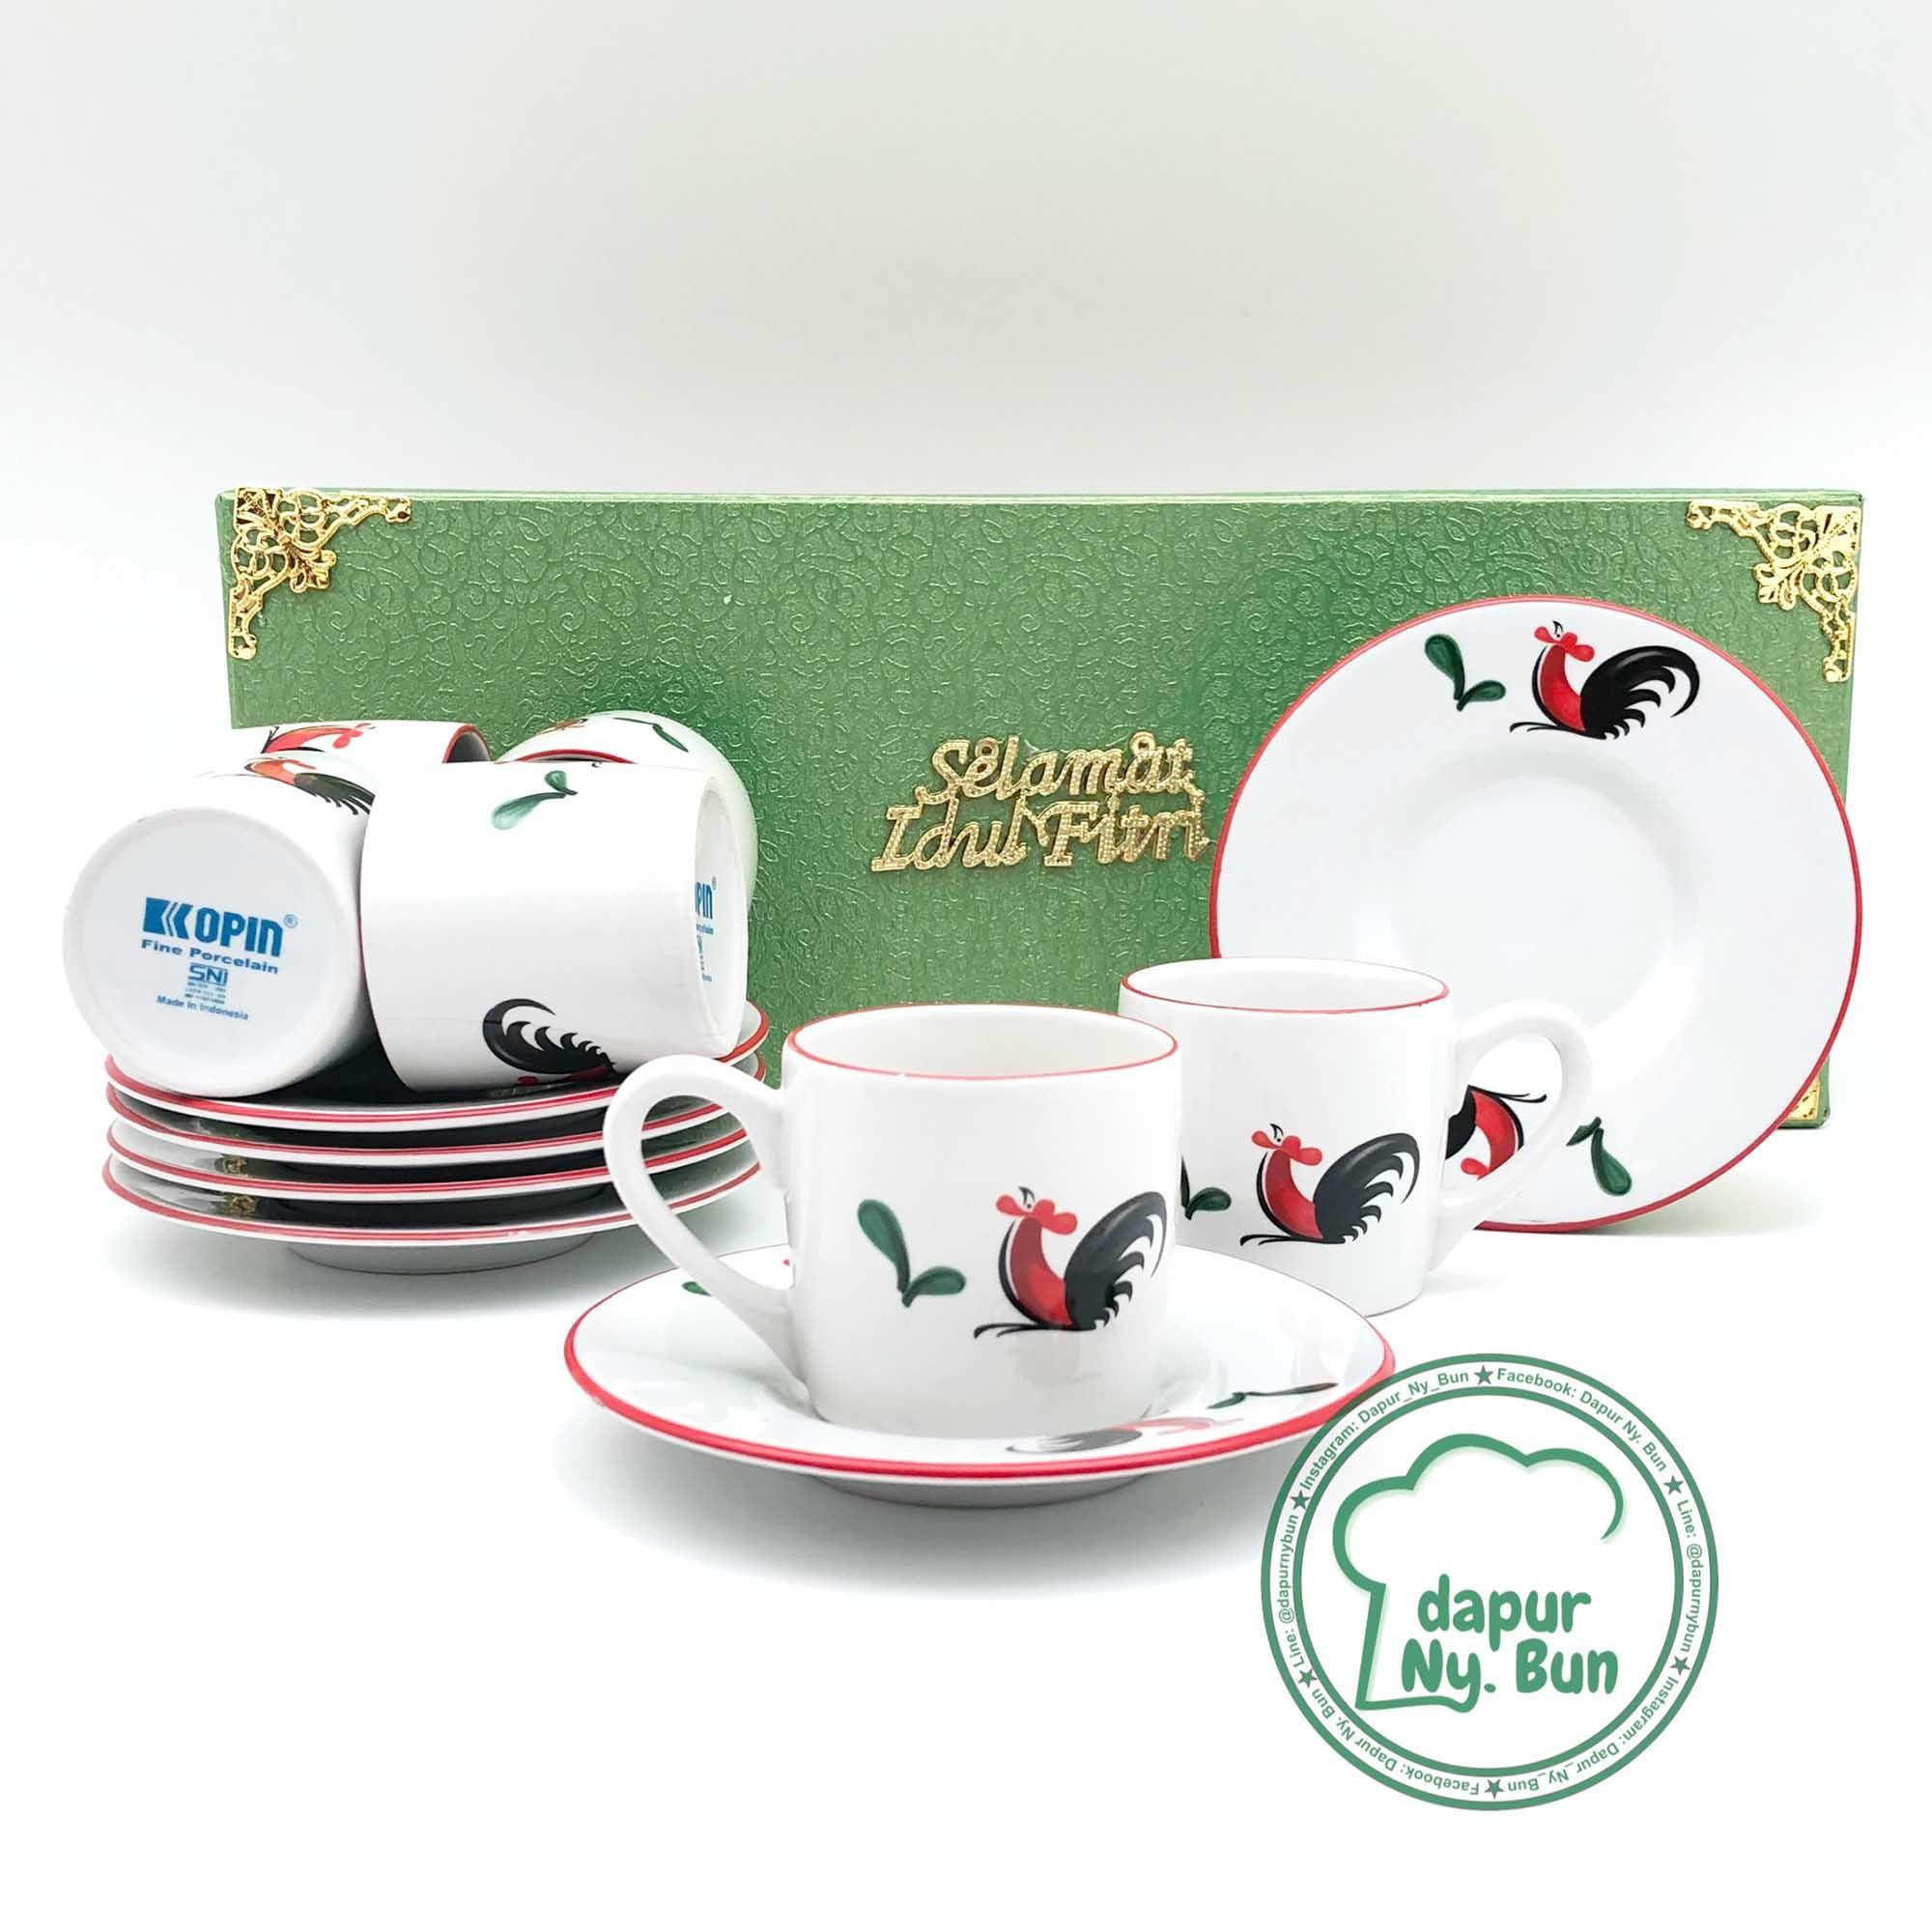 Cek Harga Baru Tea Set Gelas Cangkir Espresso Capodimonte Terkini Kaca Isi 6 Paket Lebaran Ayam Jago Seri 2 For Ied Mubarak